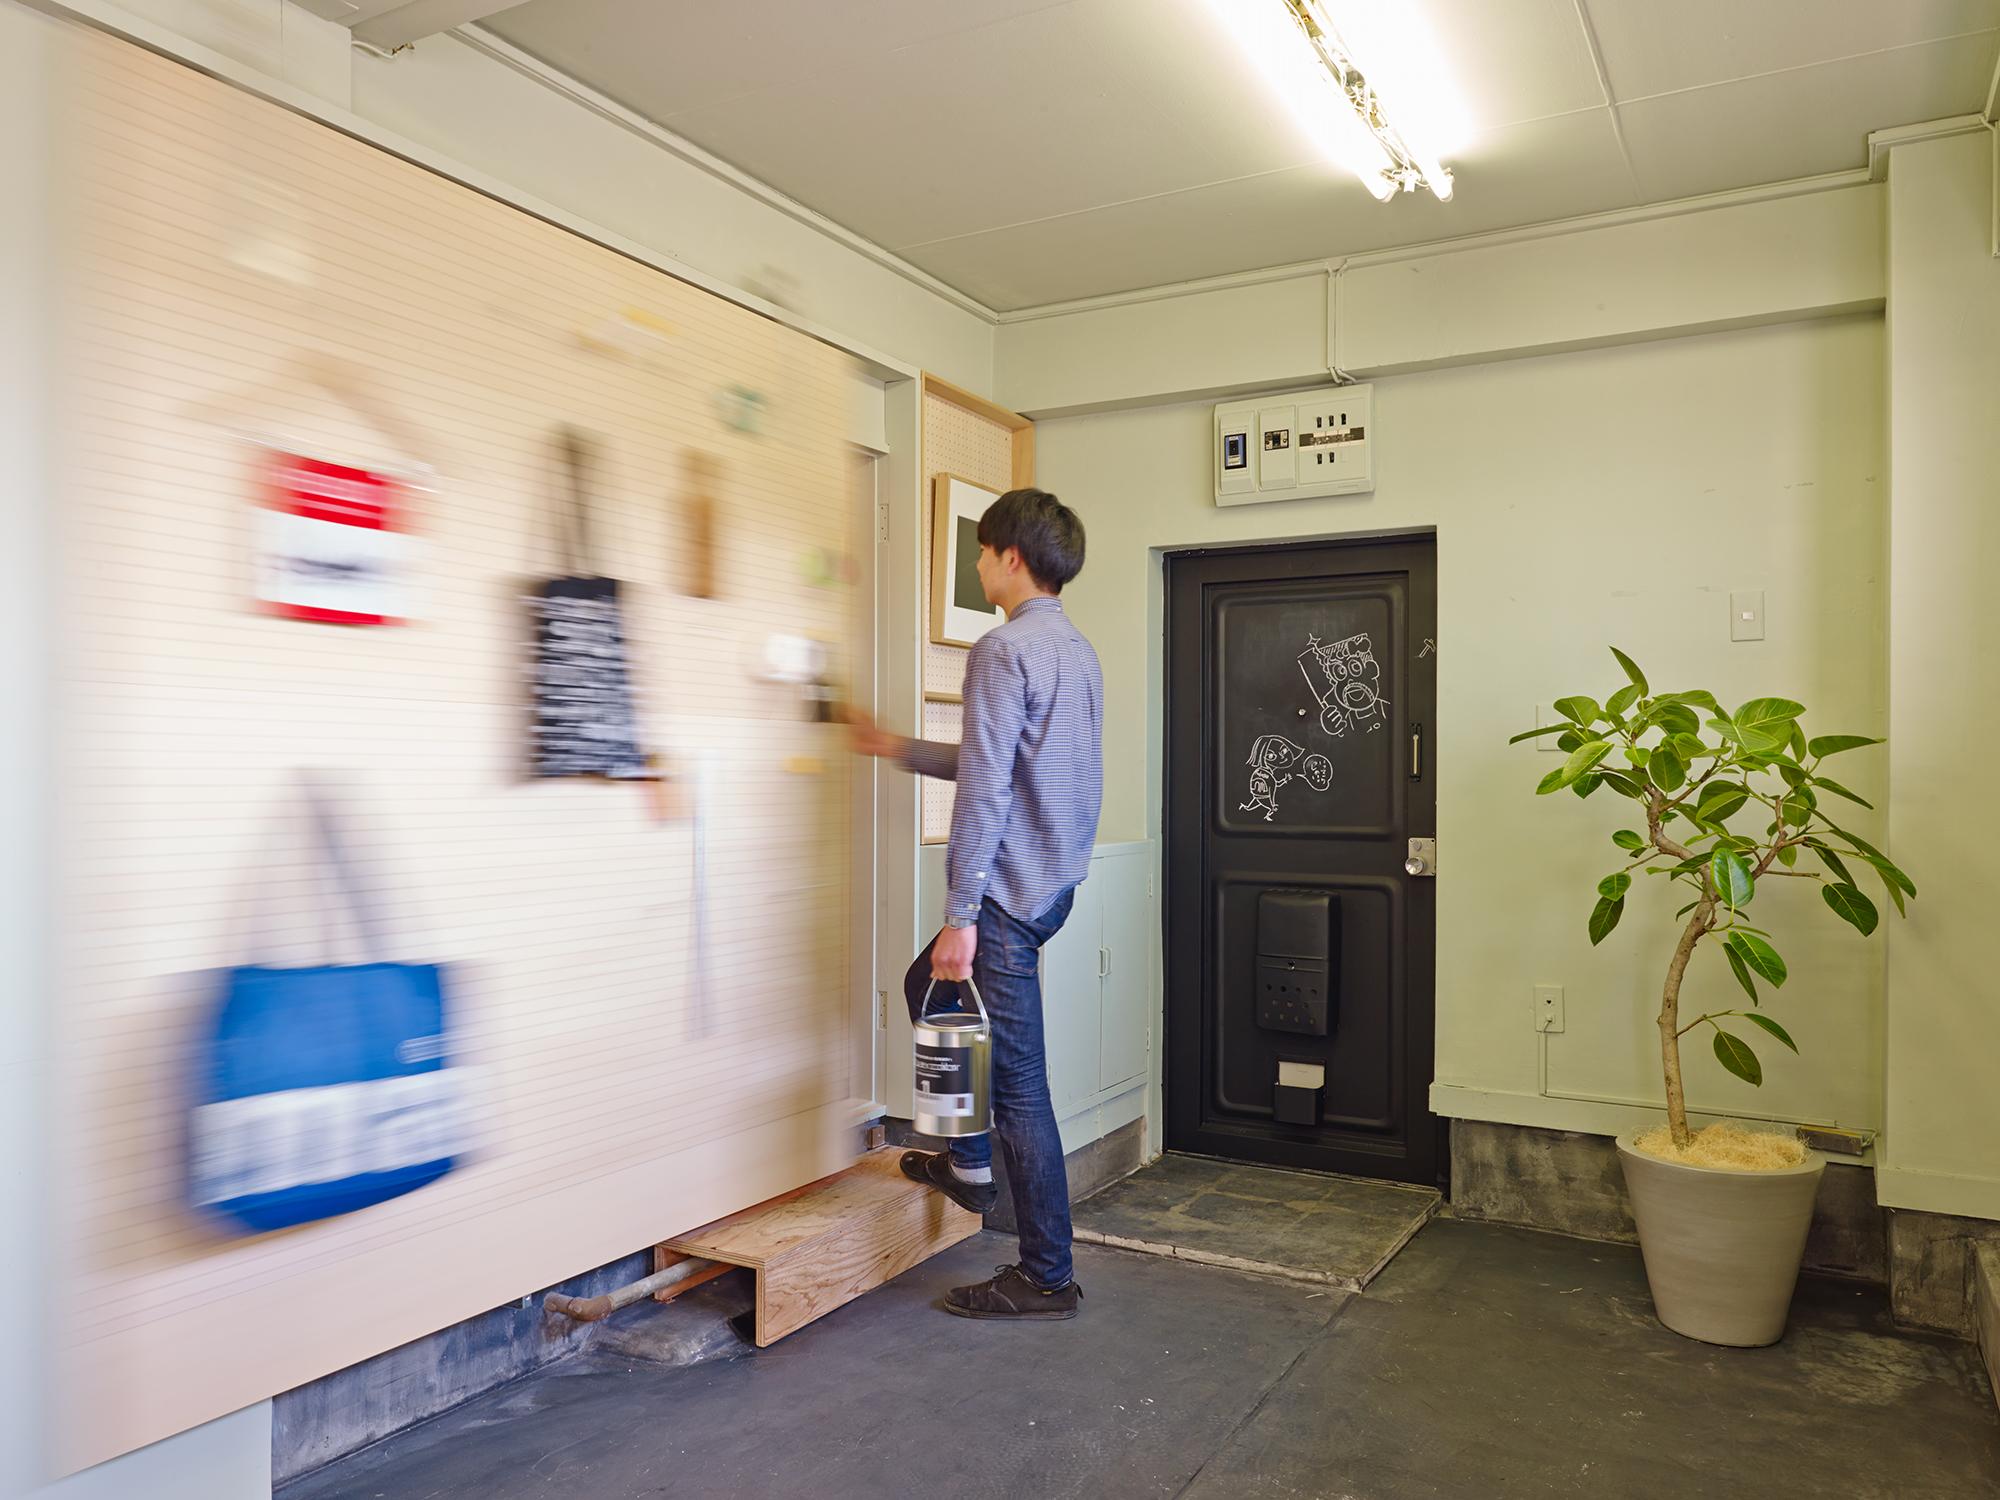 Ambassa studio